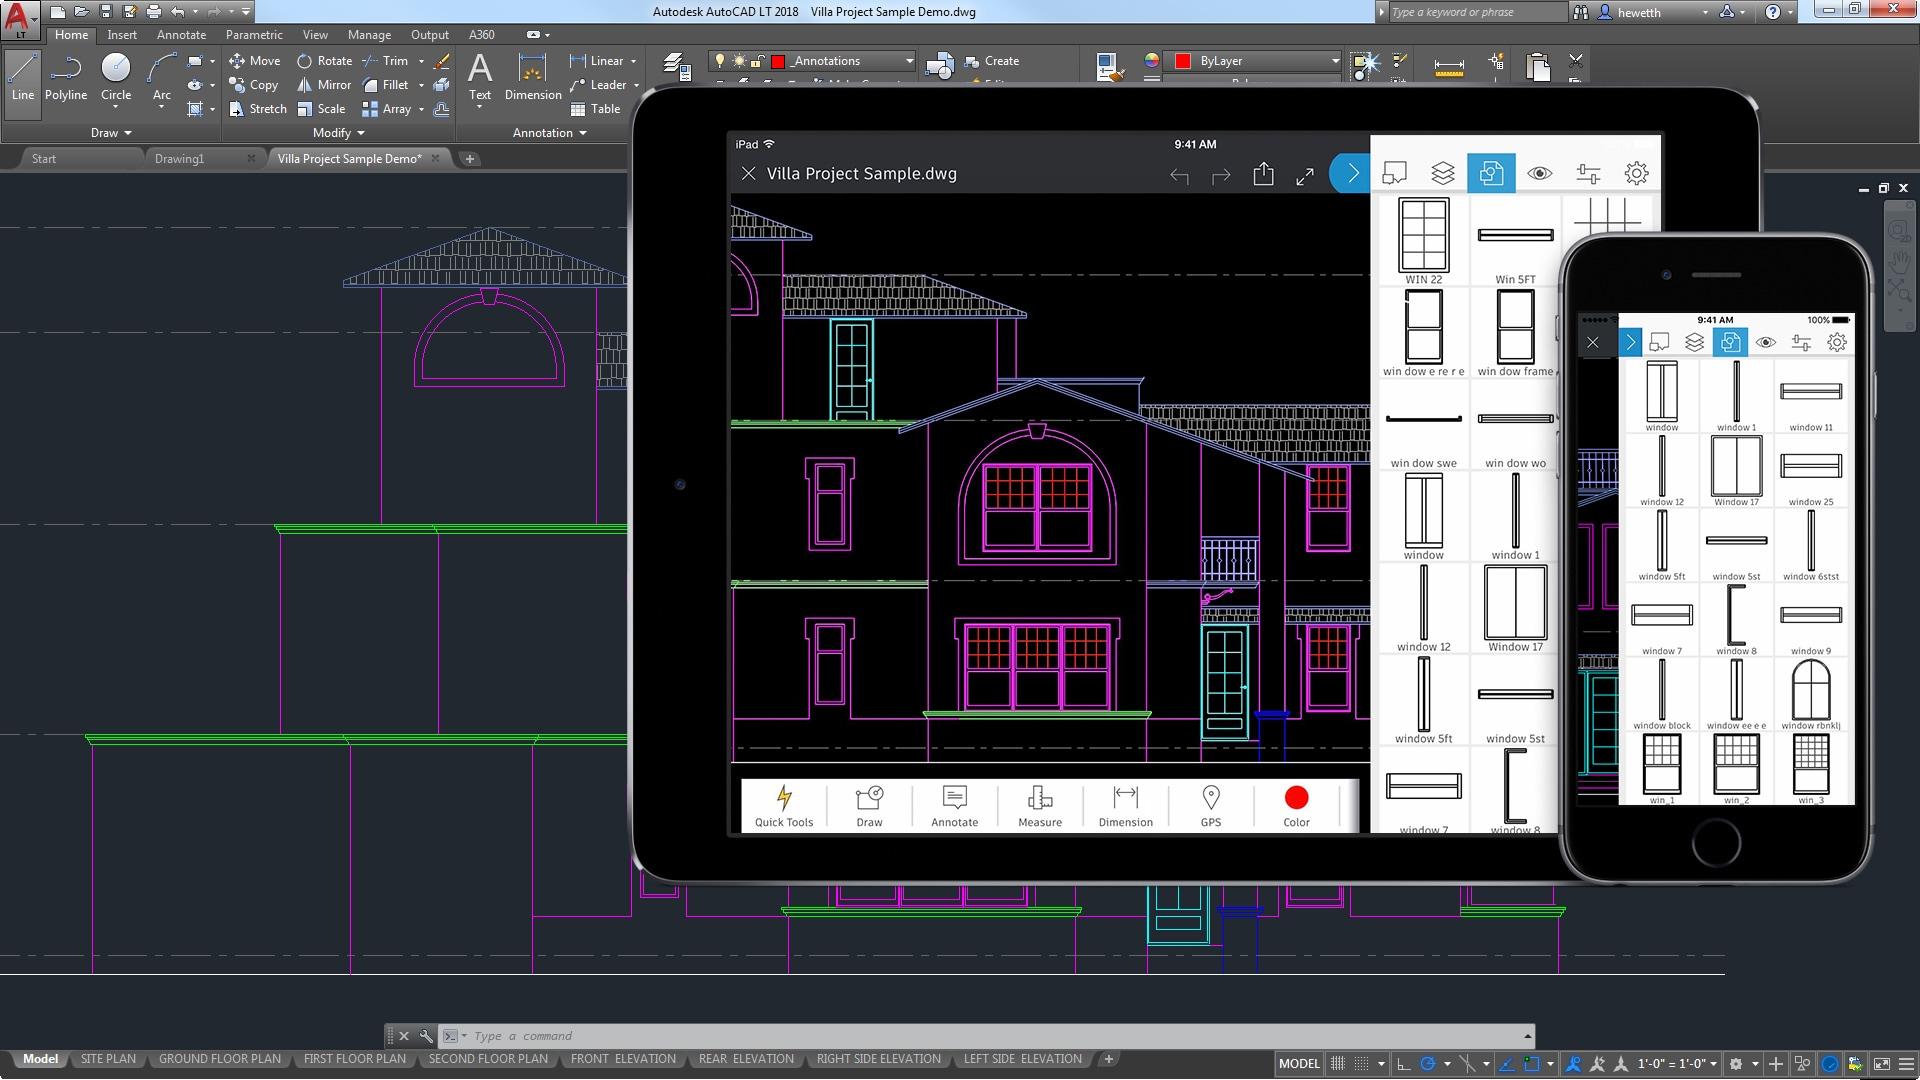 Autocad Lt 2b Cad Taslak çizim Yazılımı Autodesk